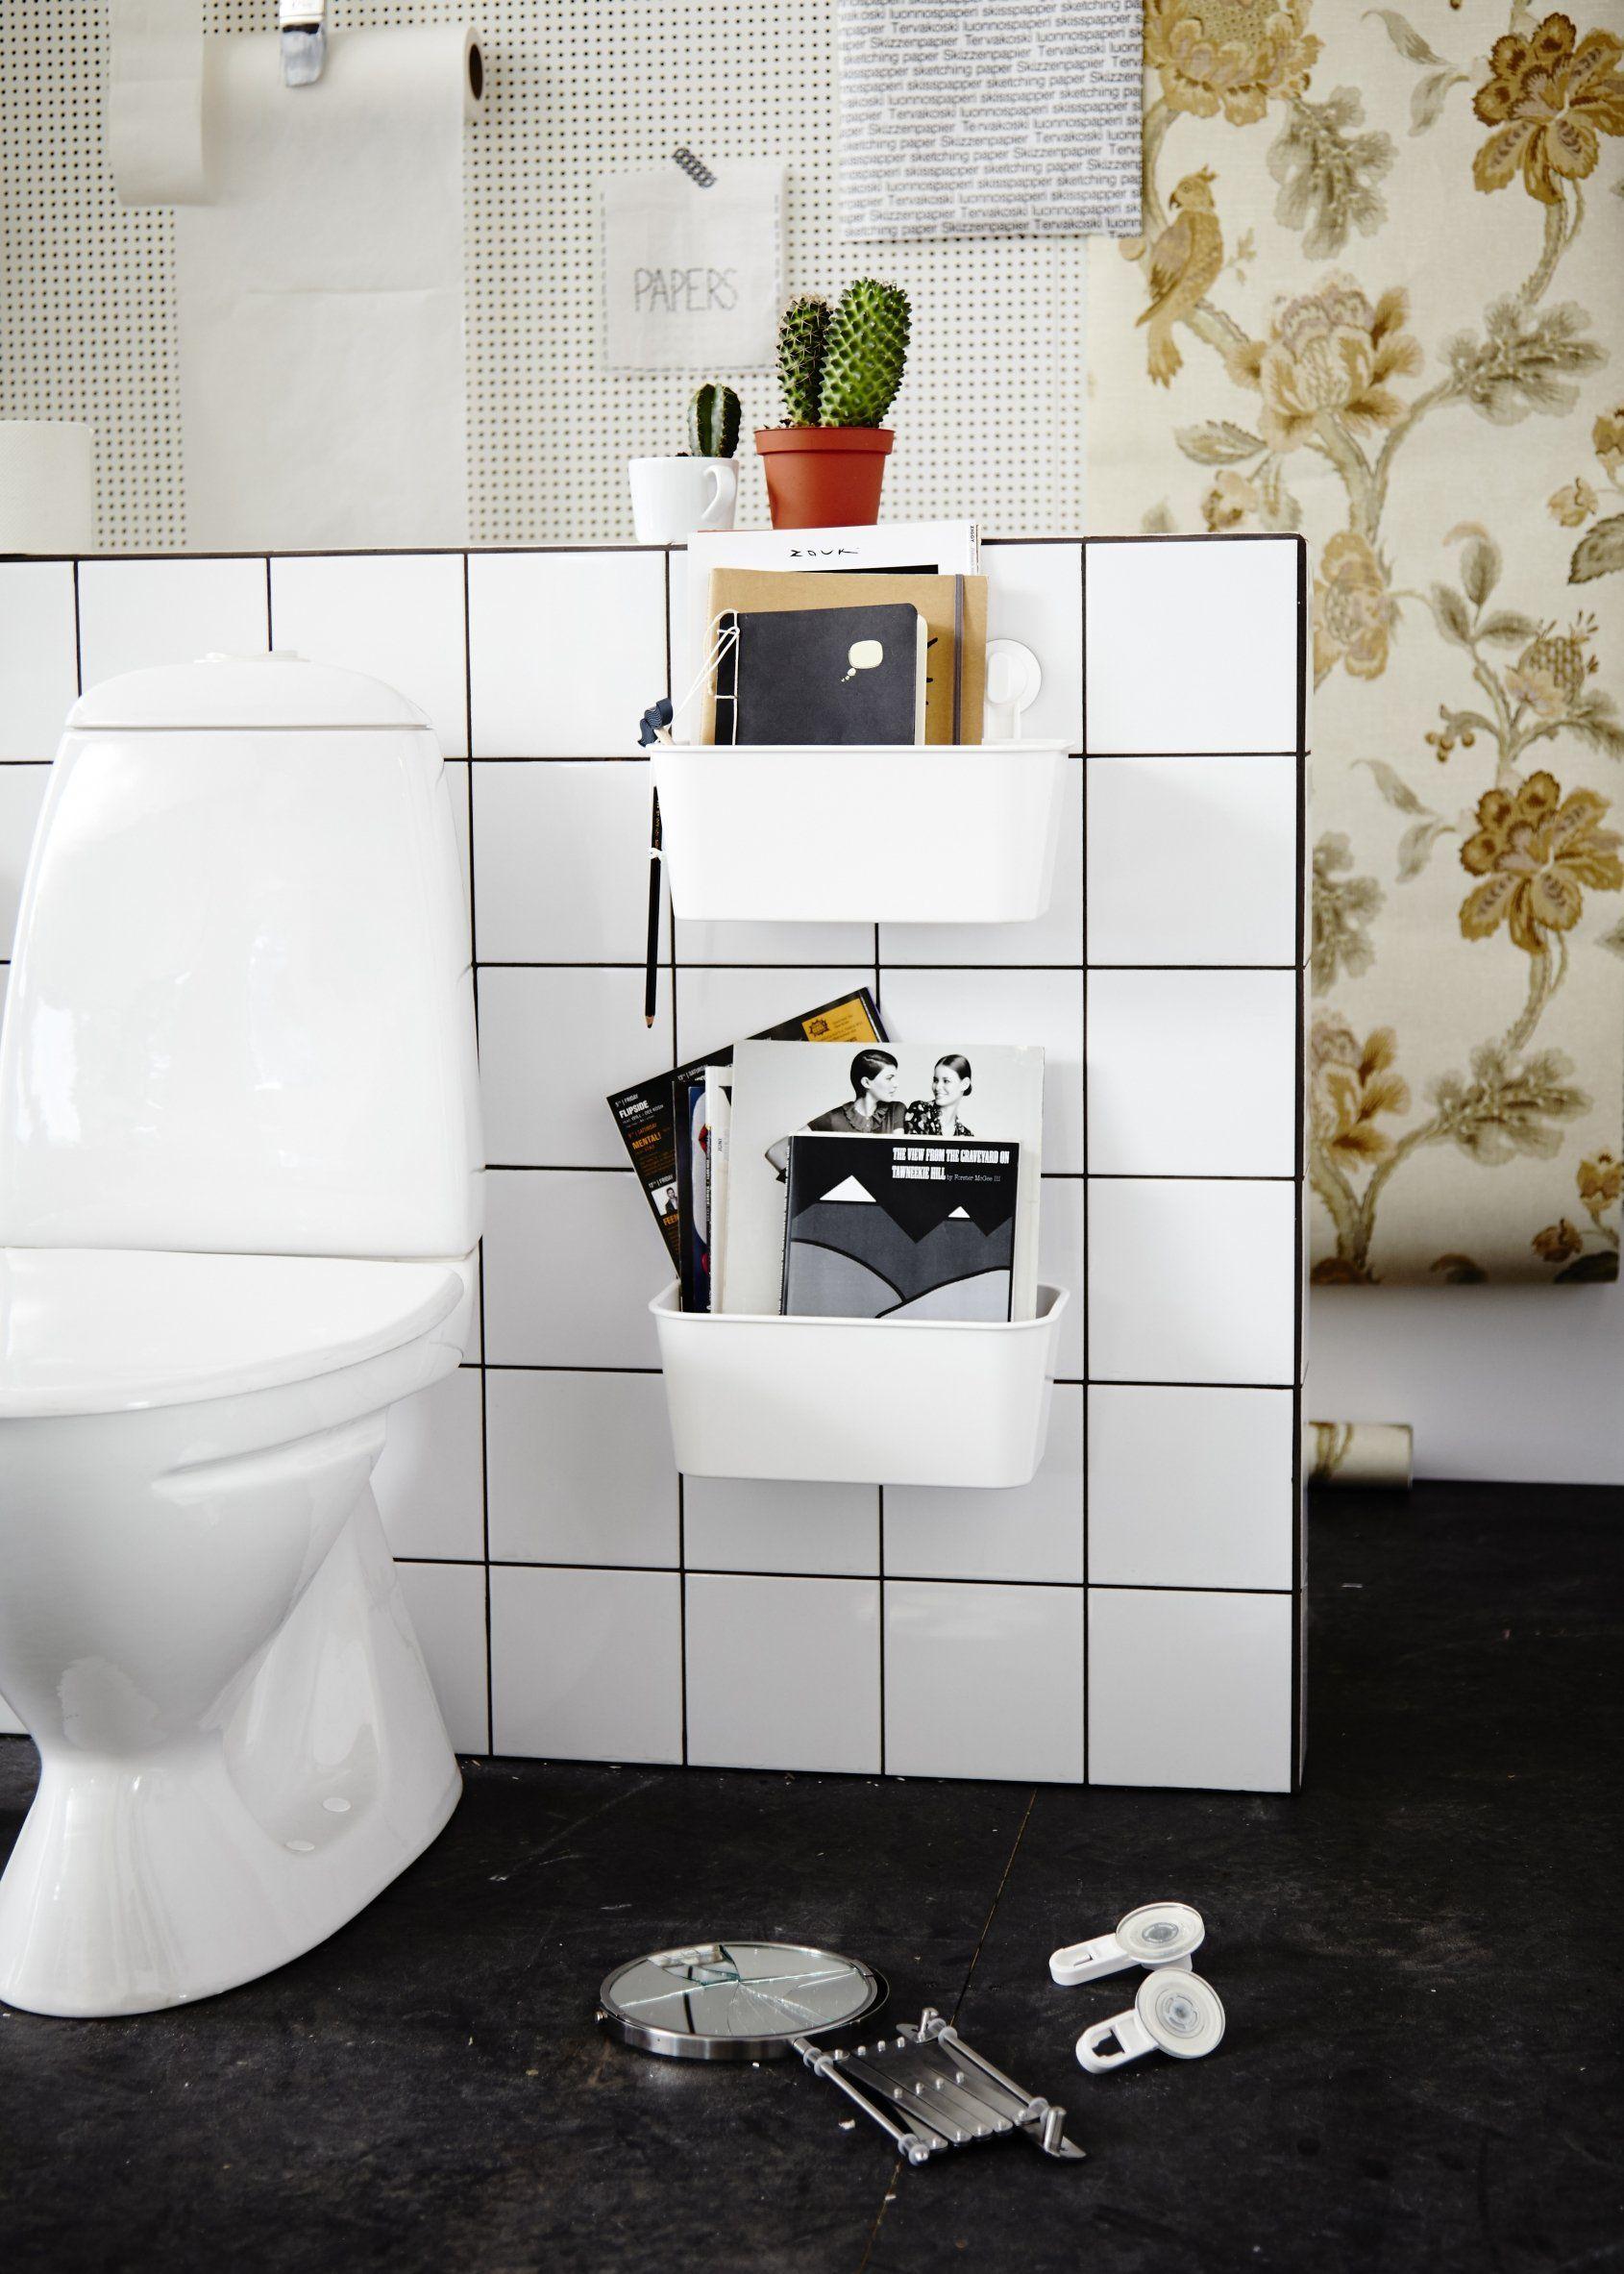 Epingle Sur Salle De Bains Bathrooms